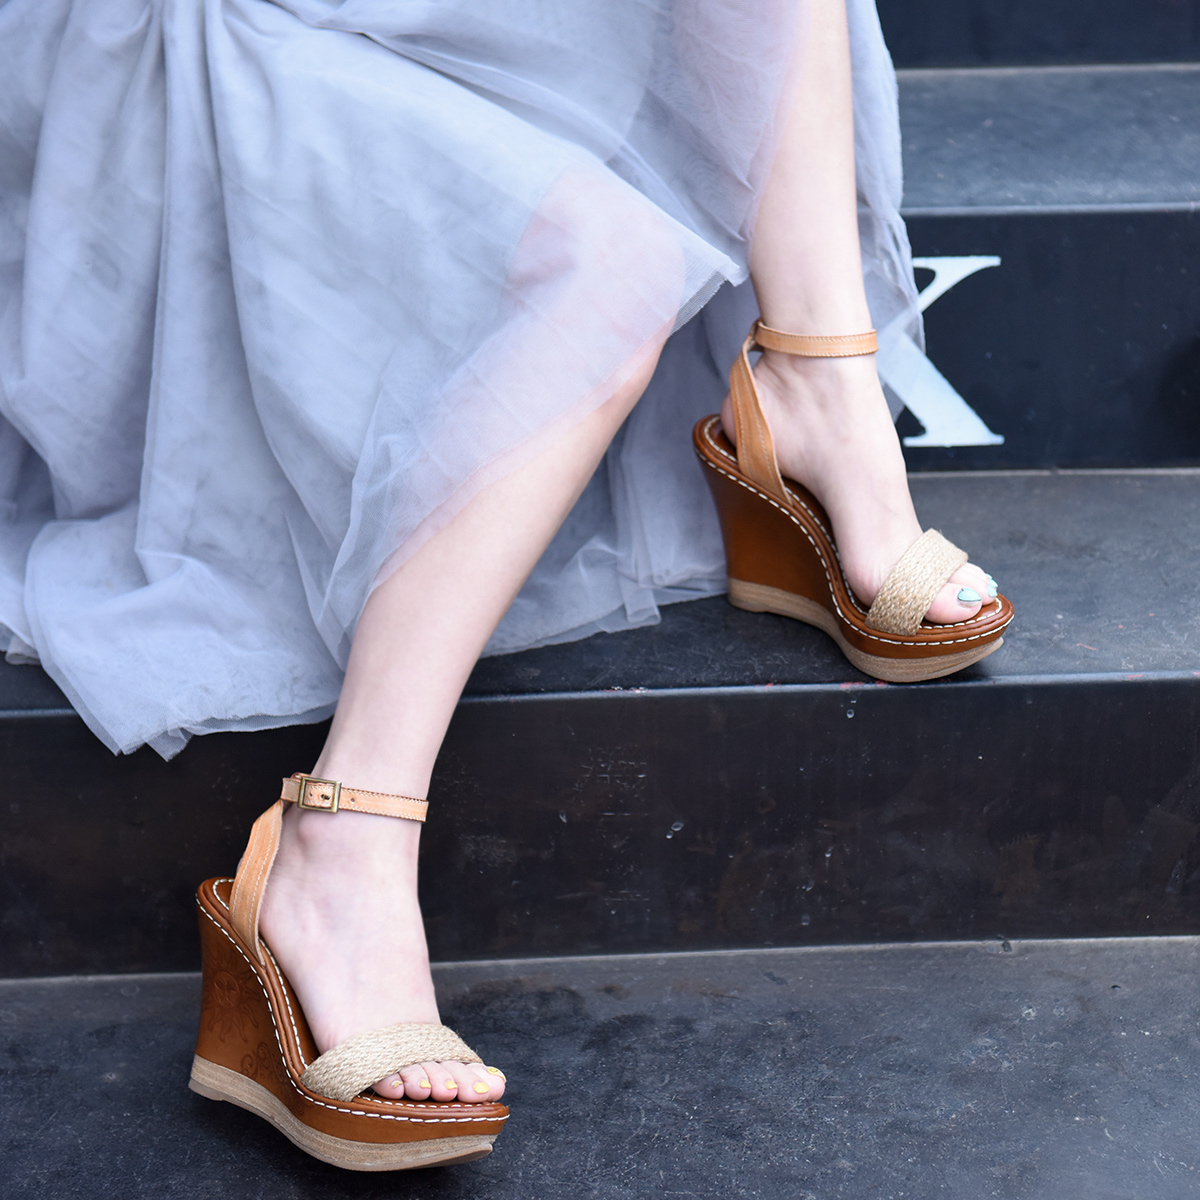 Artmu Original Retro Thick Sole Wedge Heels Women Sandals Bohemian Beach Sandals Leather High Heels Platform Handmade Shoes-in High Heels from Shoes    1